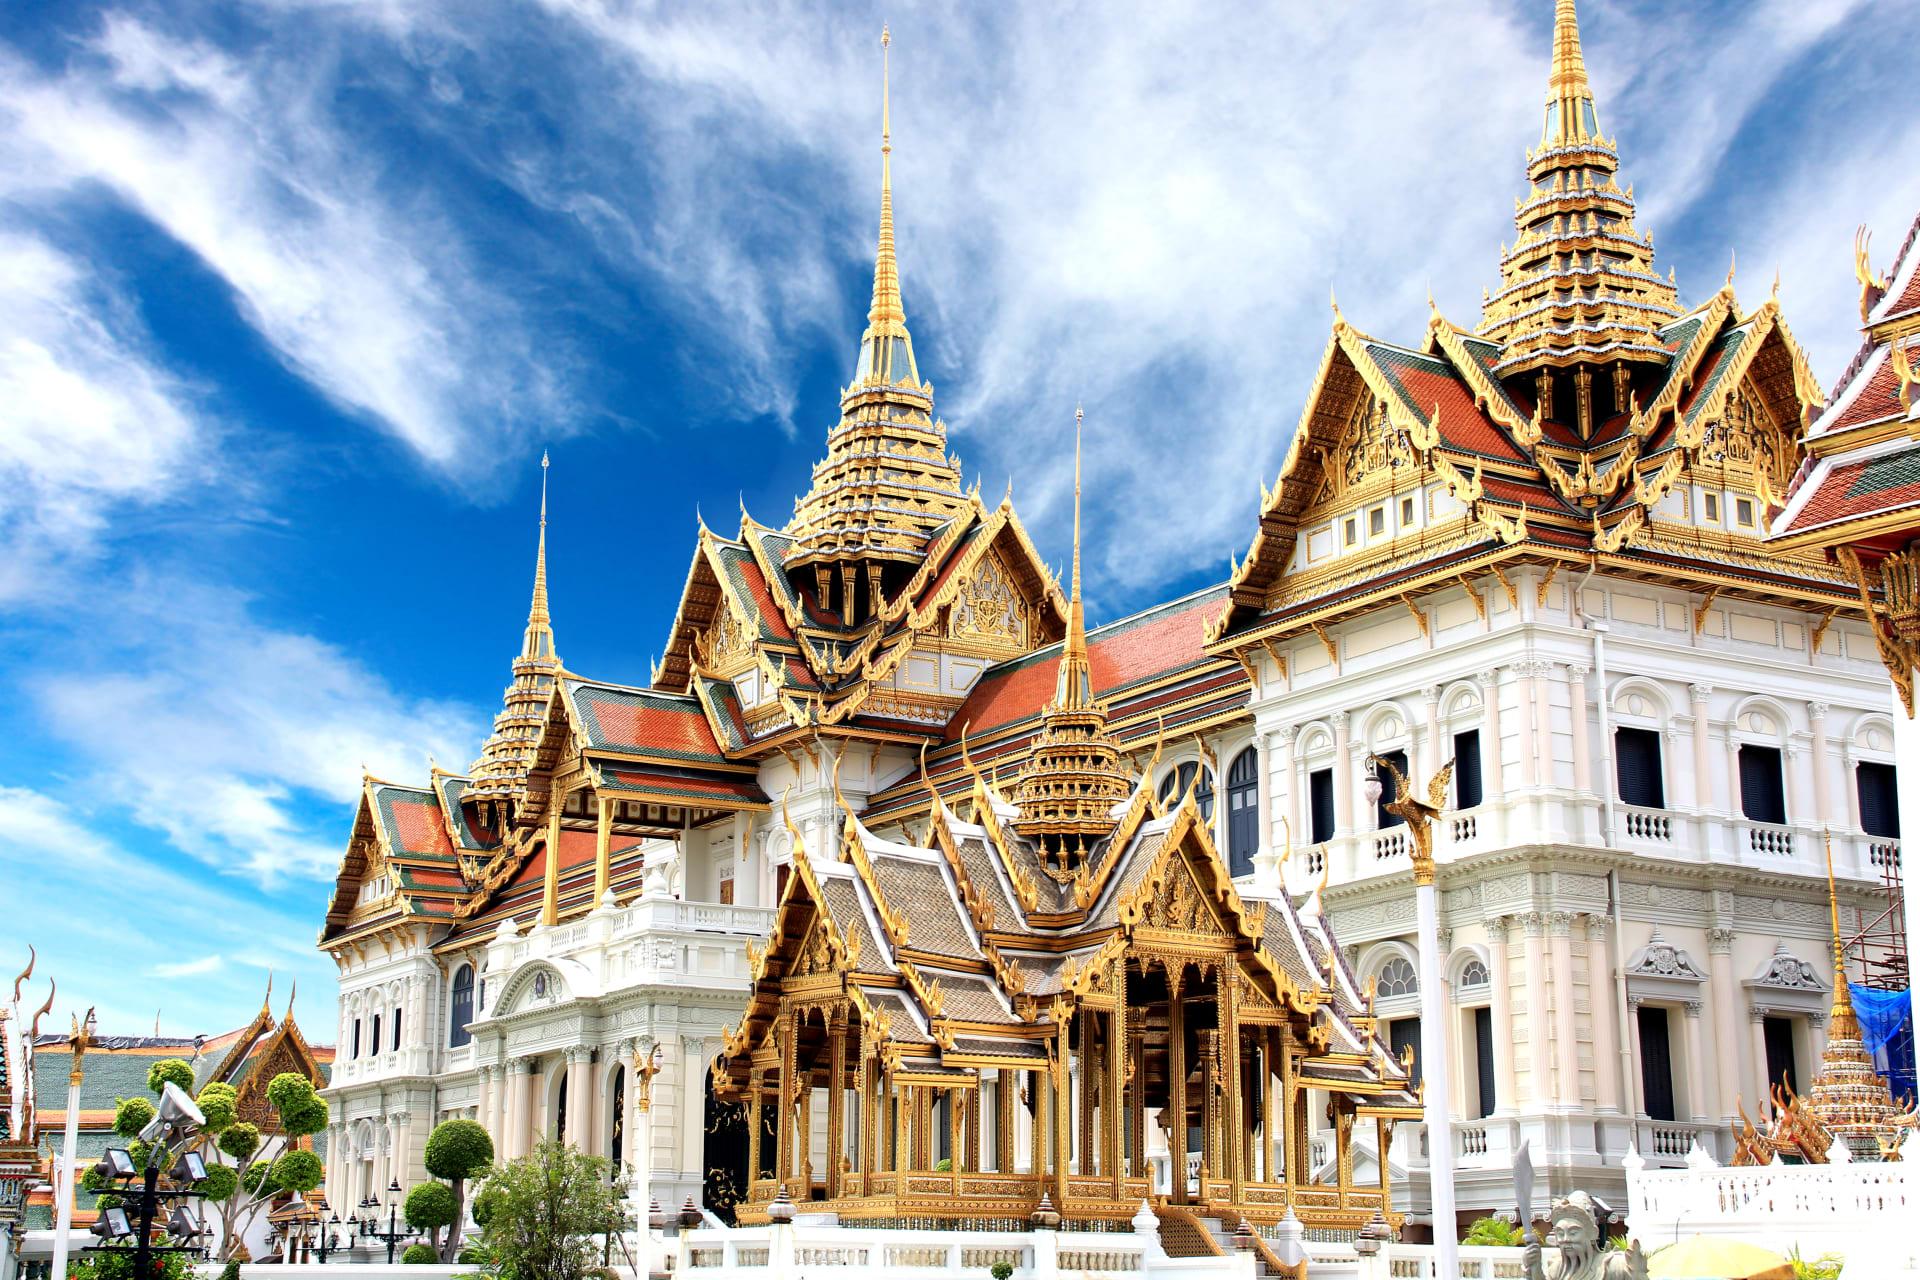 Bangkok - Riding on motorbike to view Bangkok old city